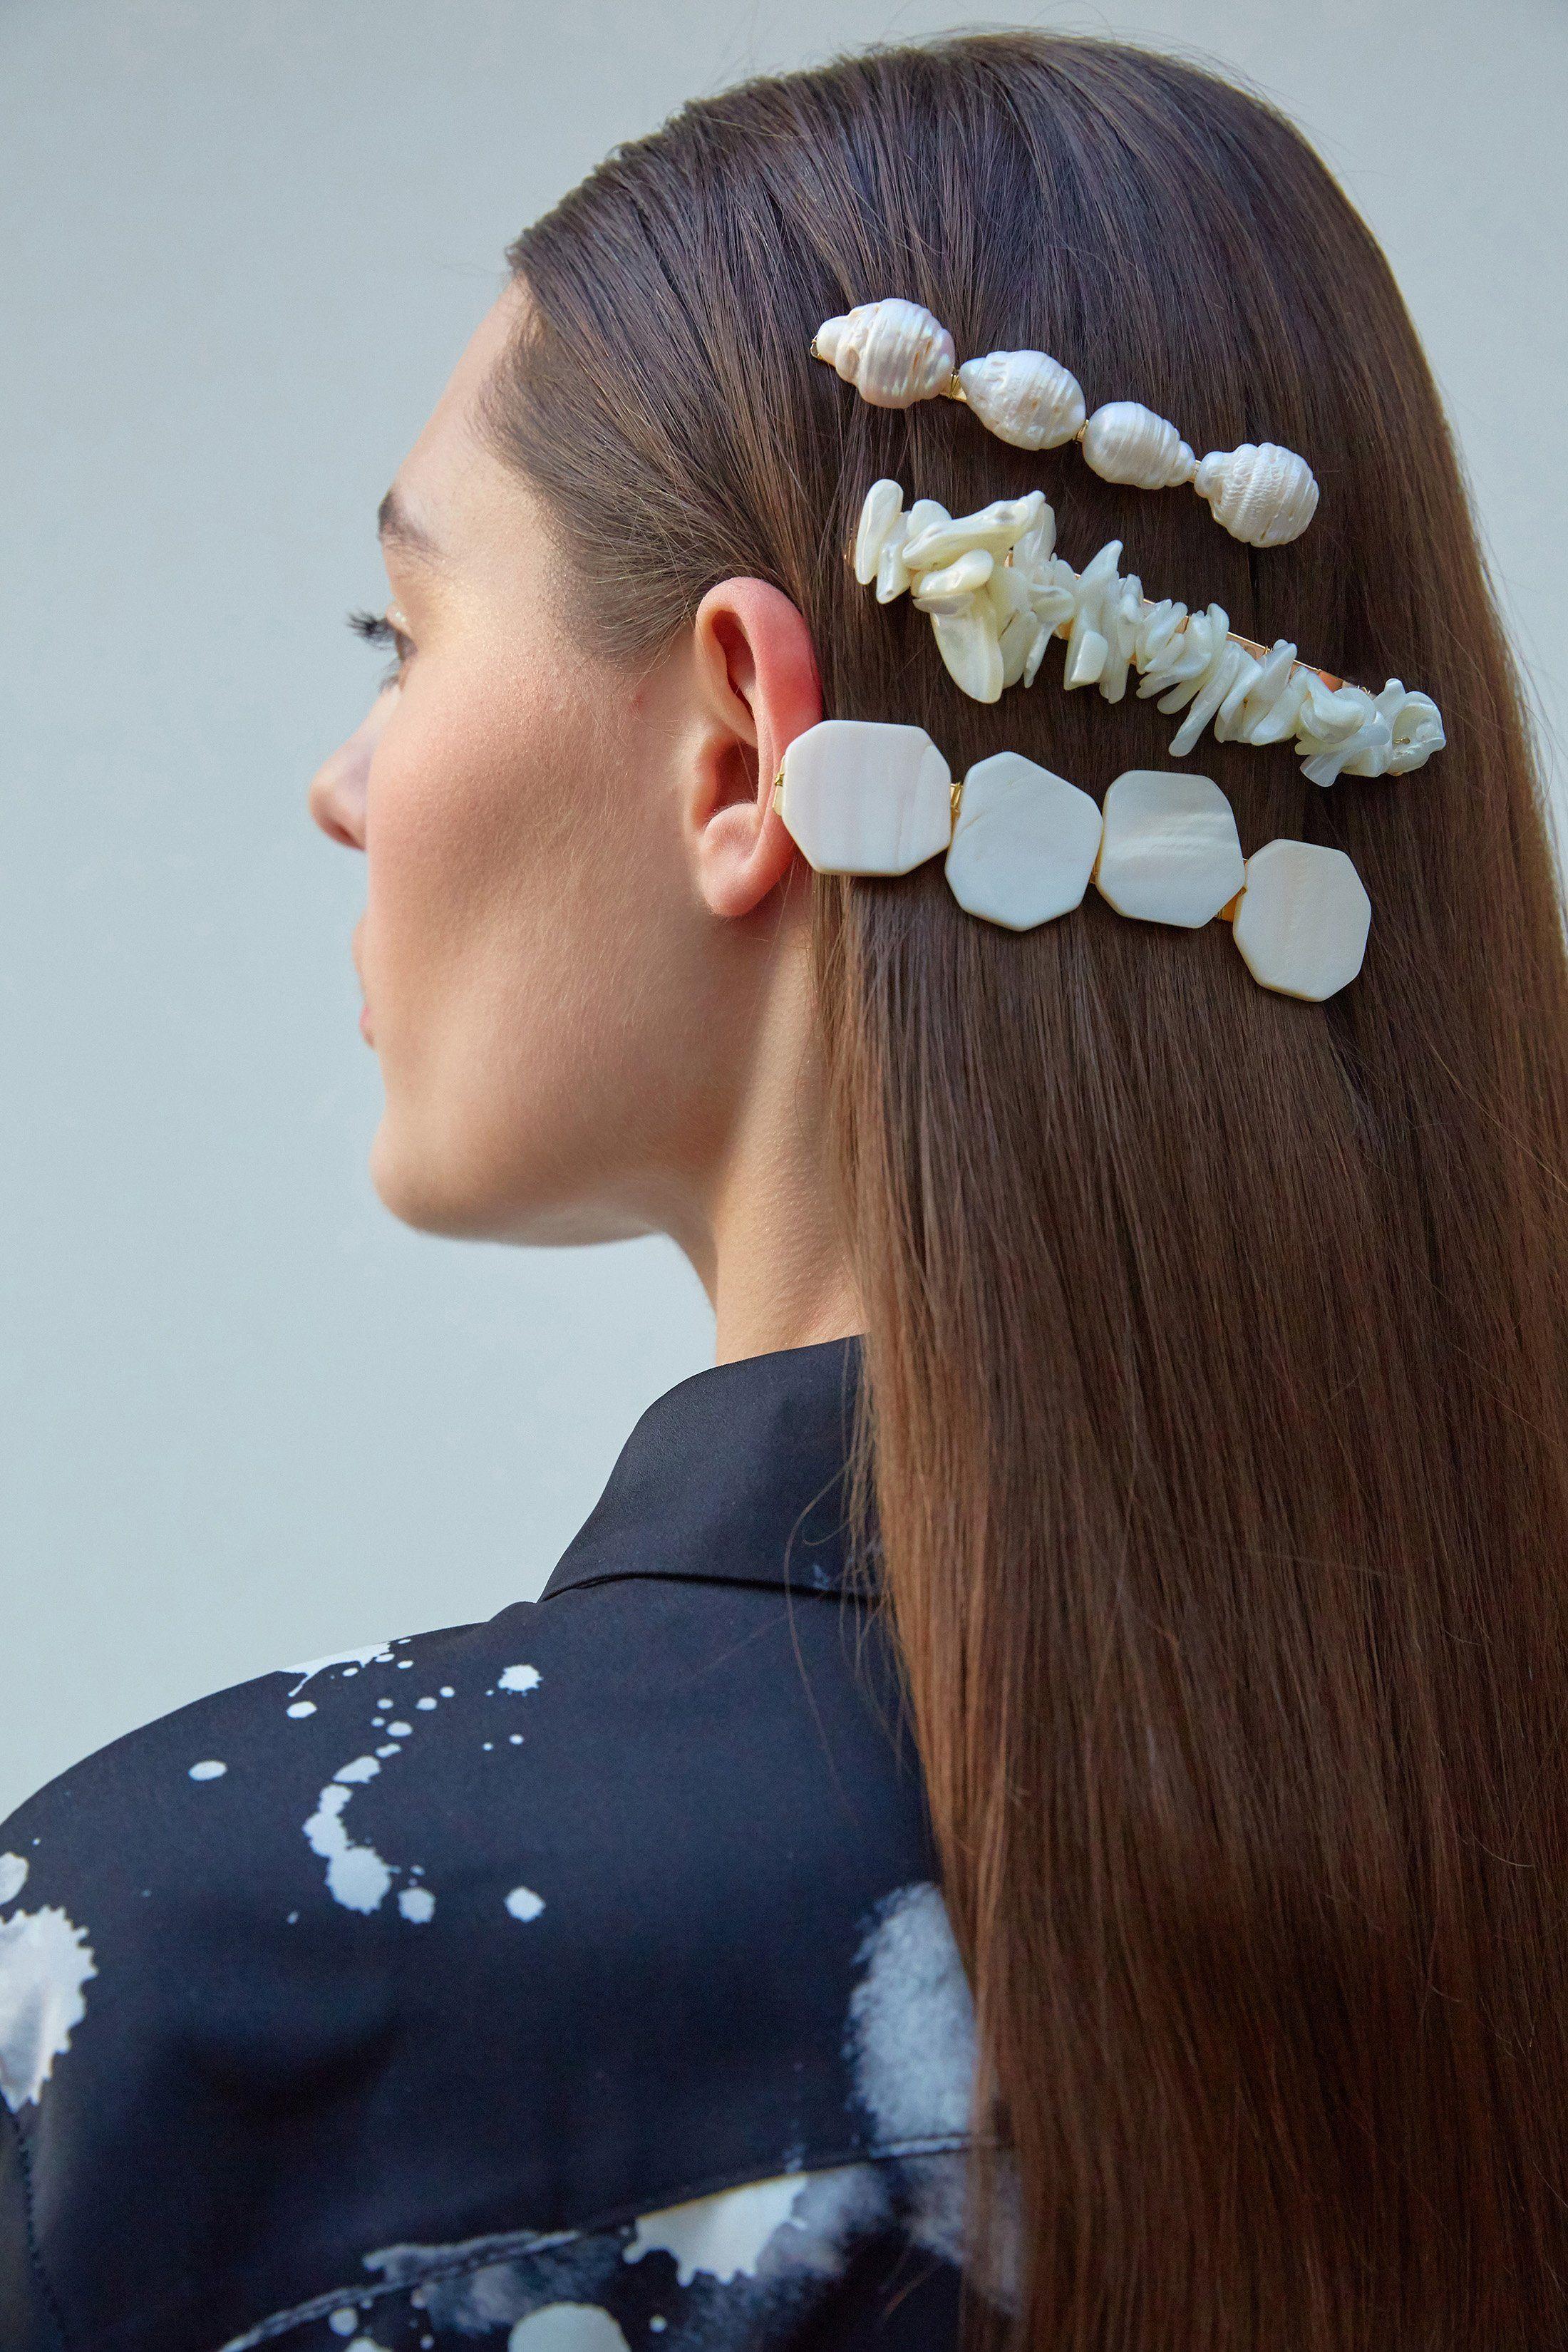 Trendy Hair Accessories Kawaii Food Hair Accessory Japanese Food Scrunchy Noodles Inspired Hair Accessories Unique Hair Accessories